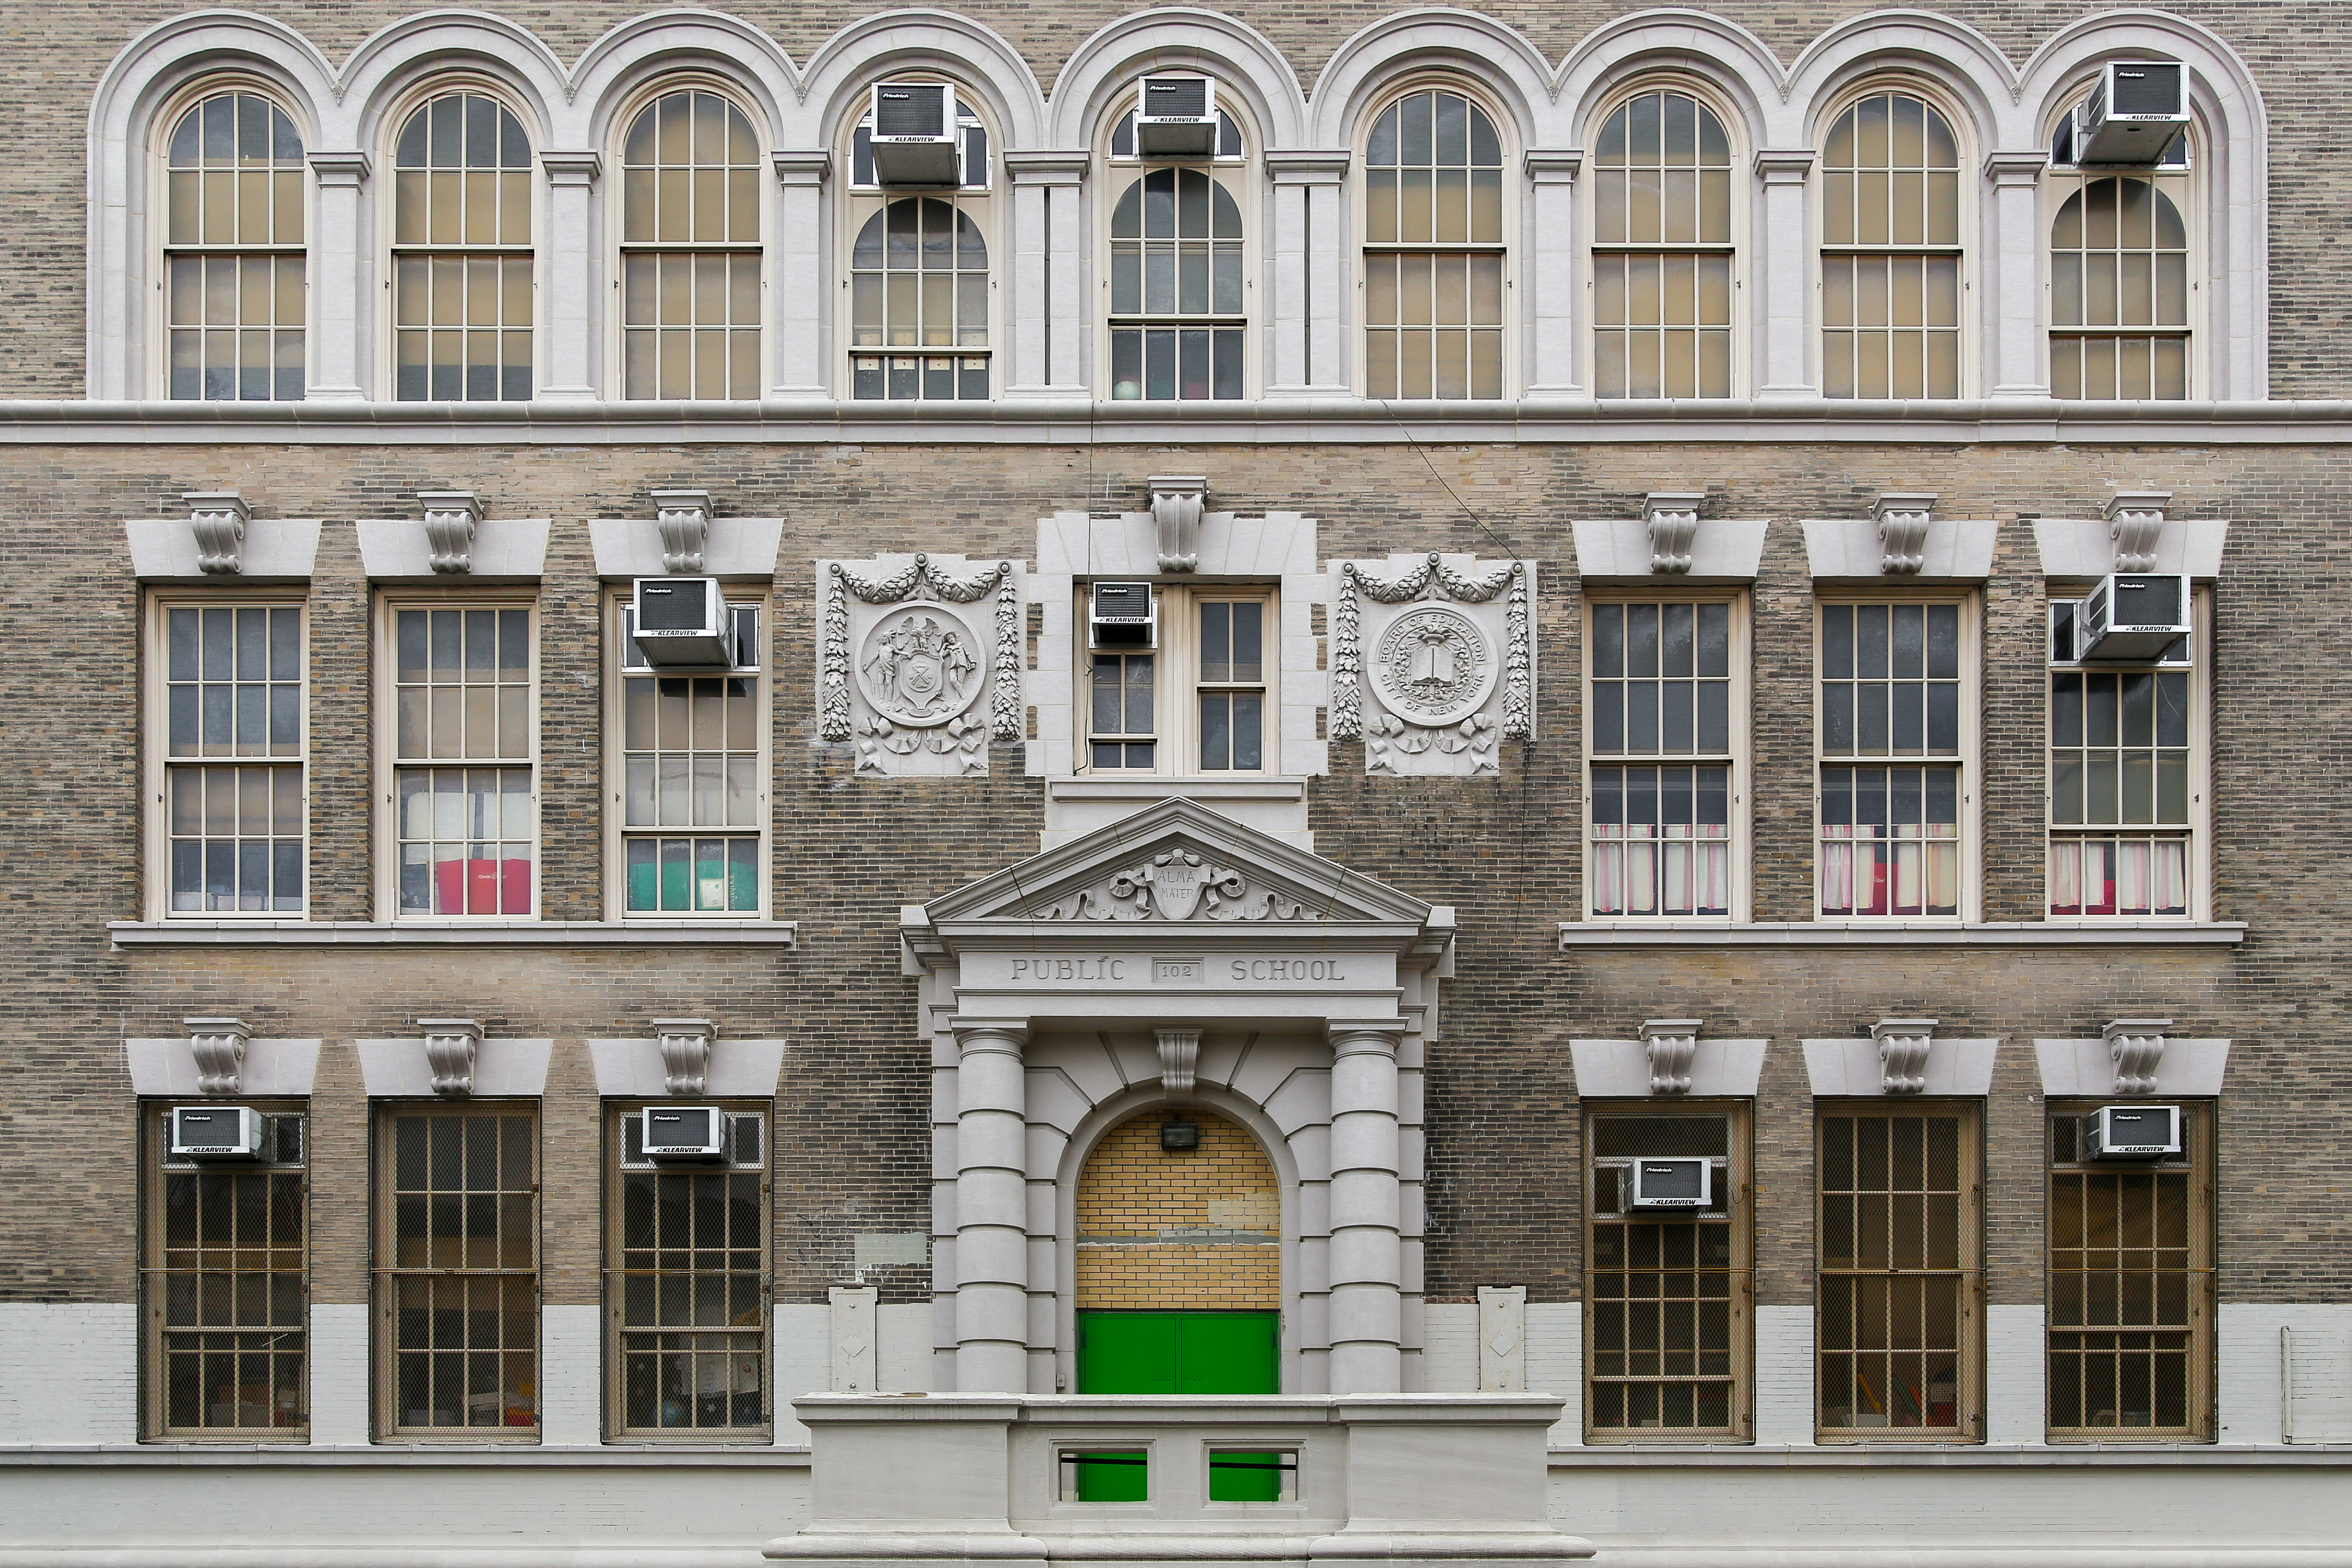 Historic brick building of Public school in Brooklyn, New York.